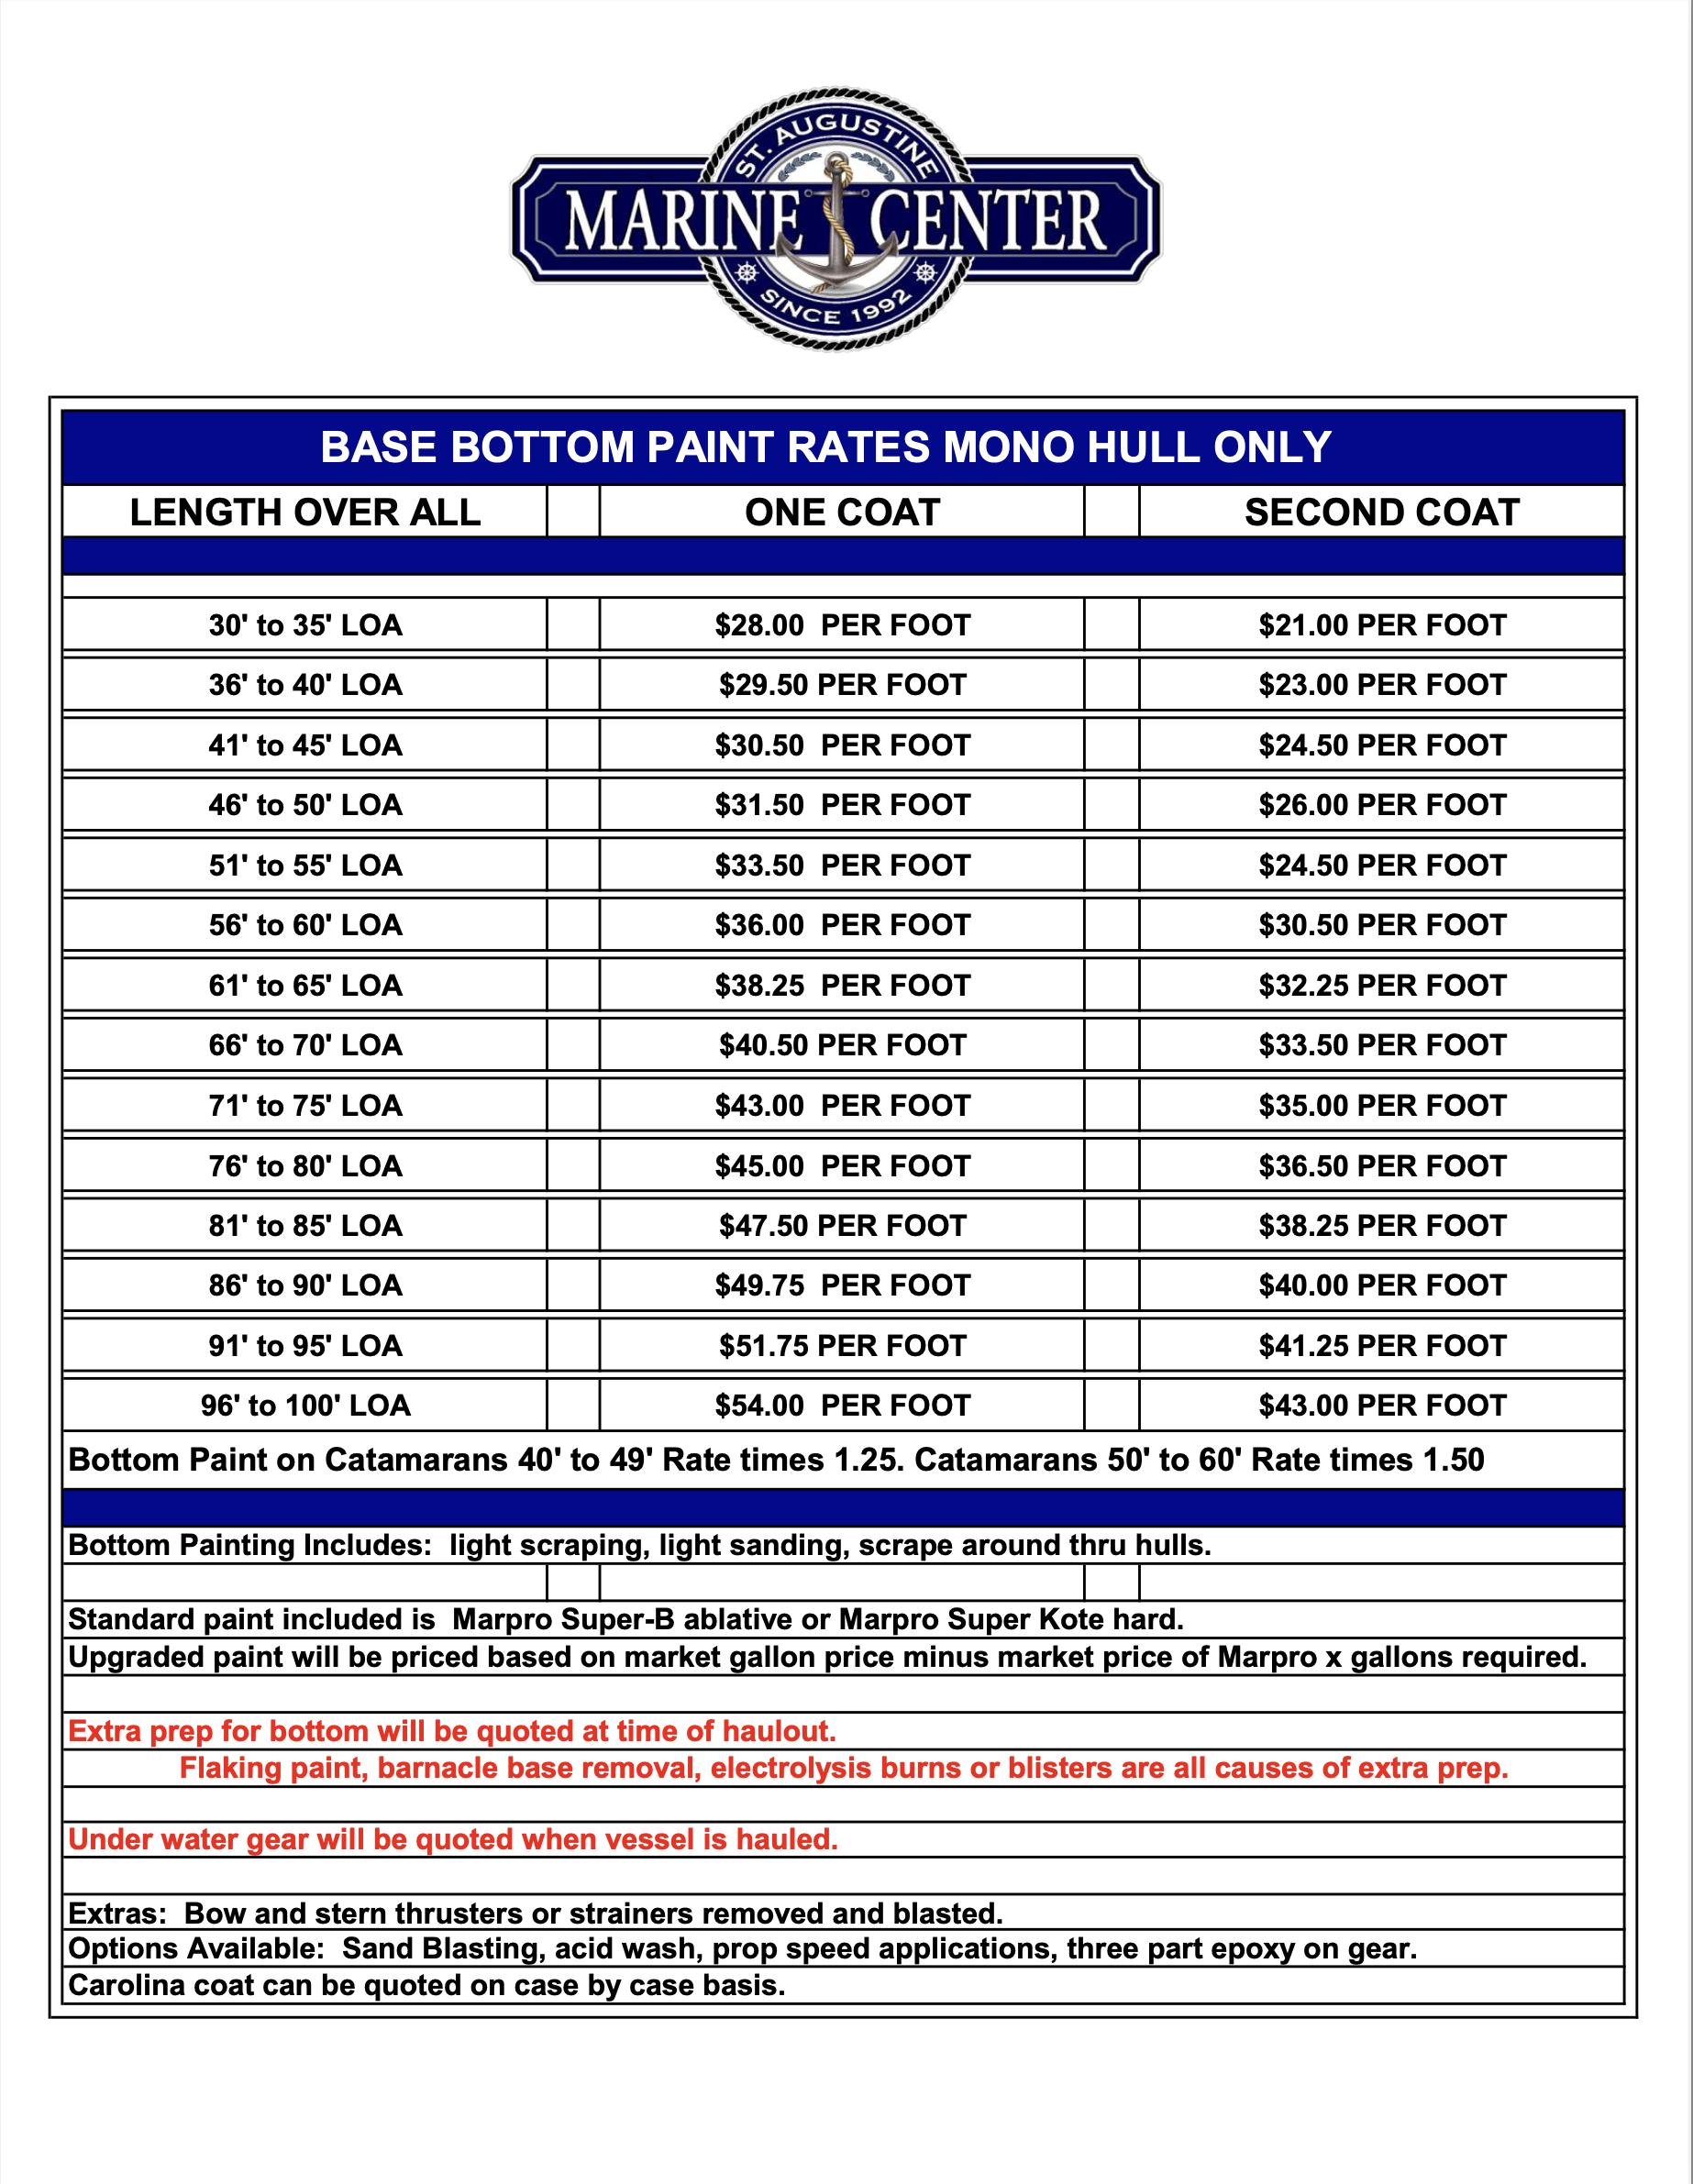 St Augustine Marine Center Rates 10-21 p4